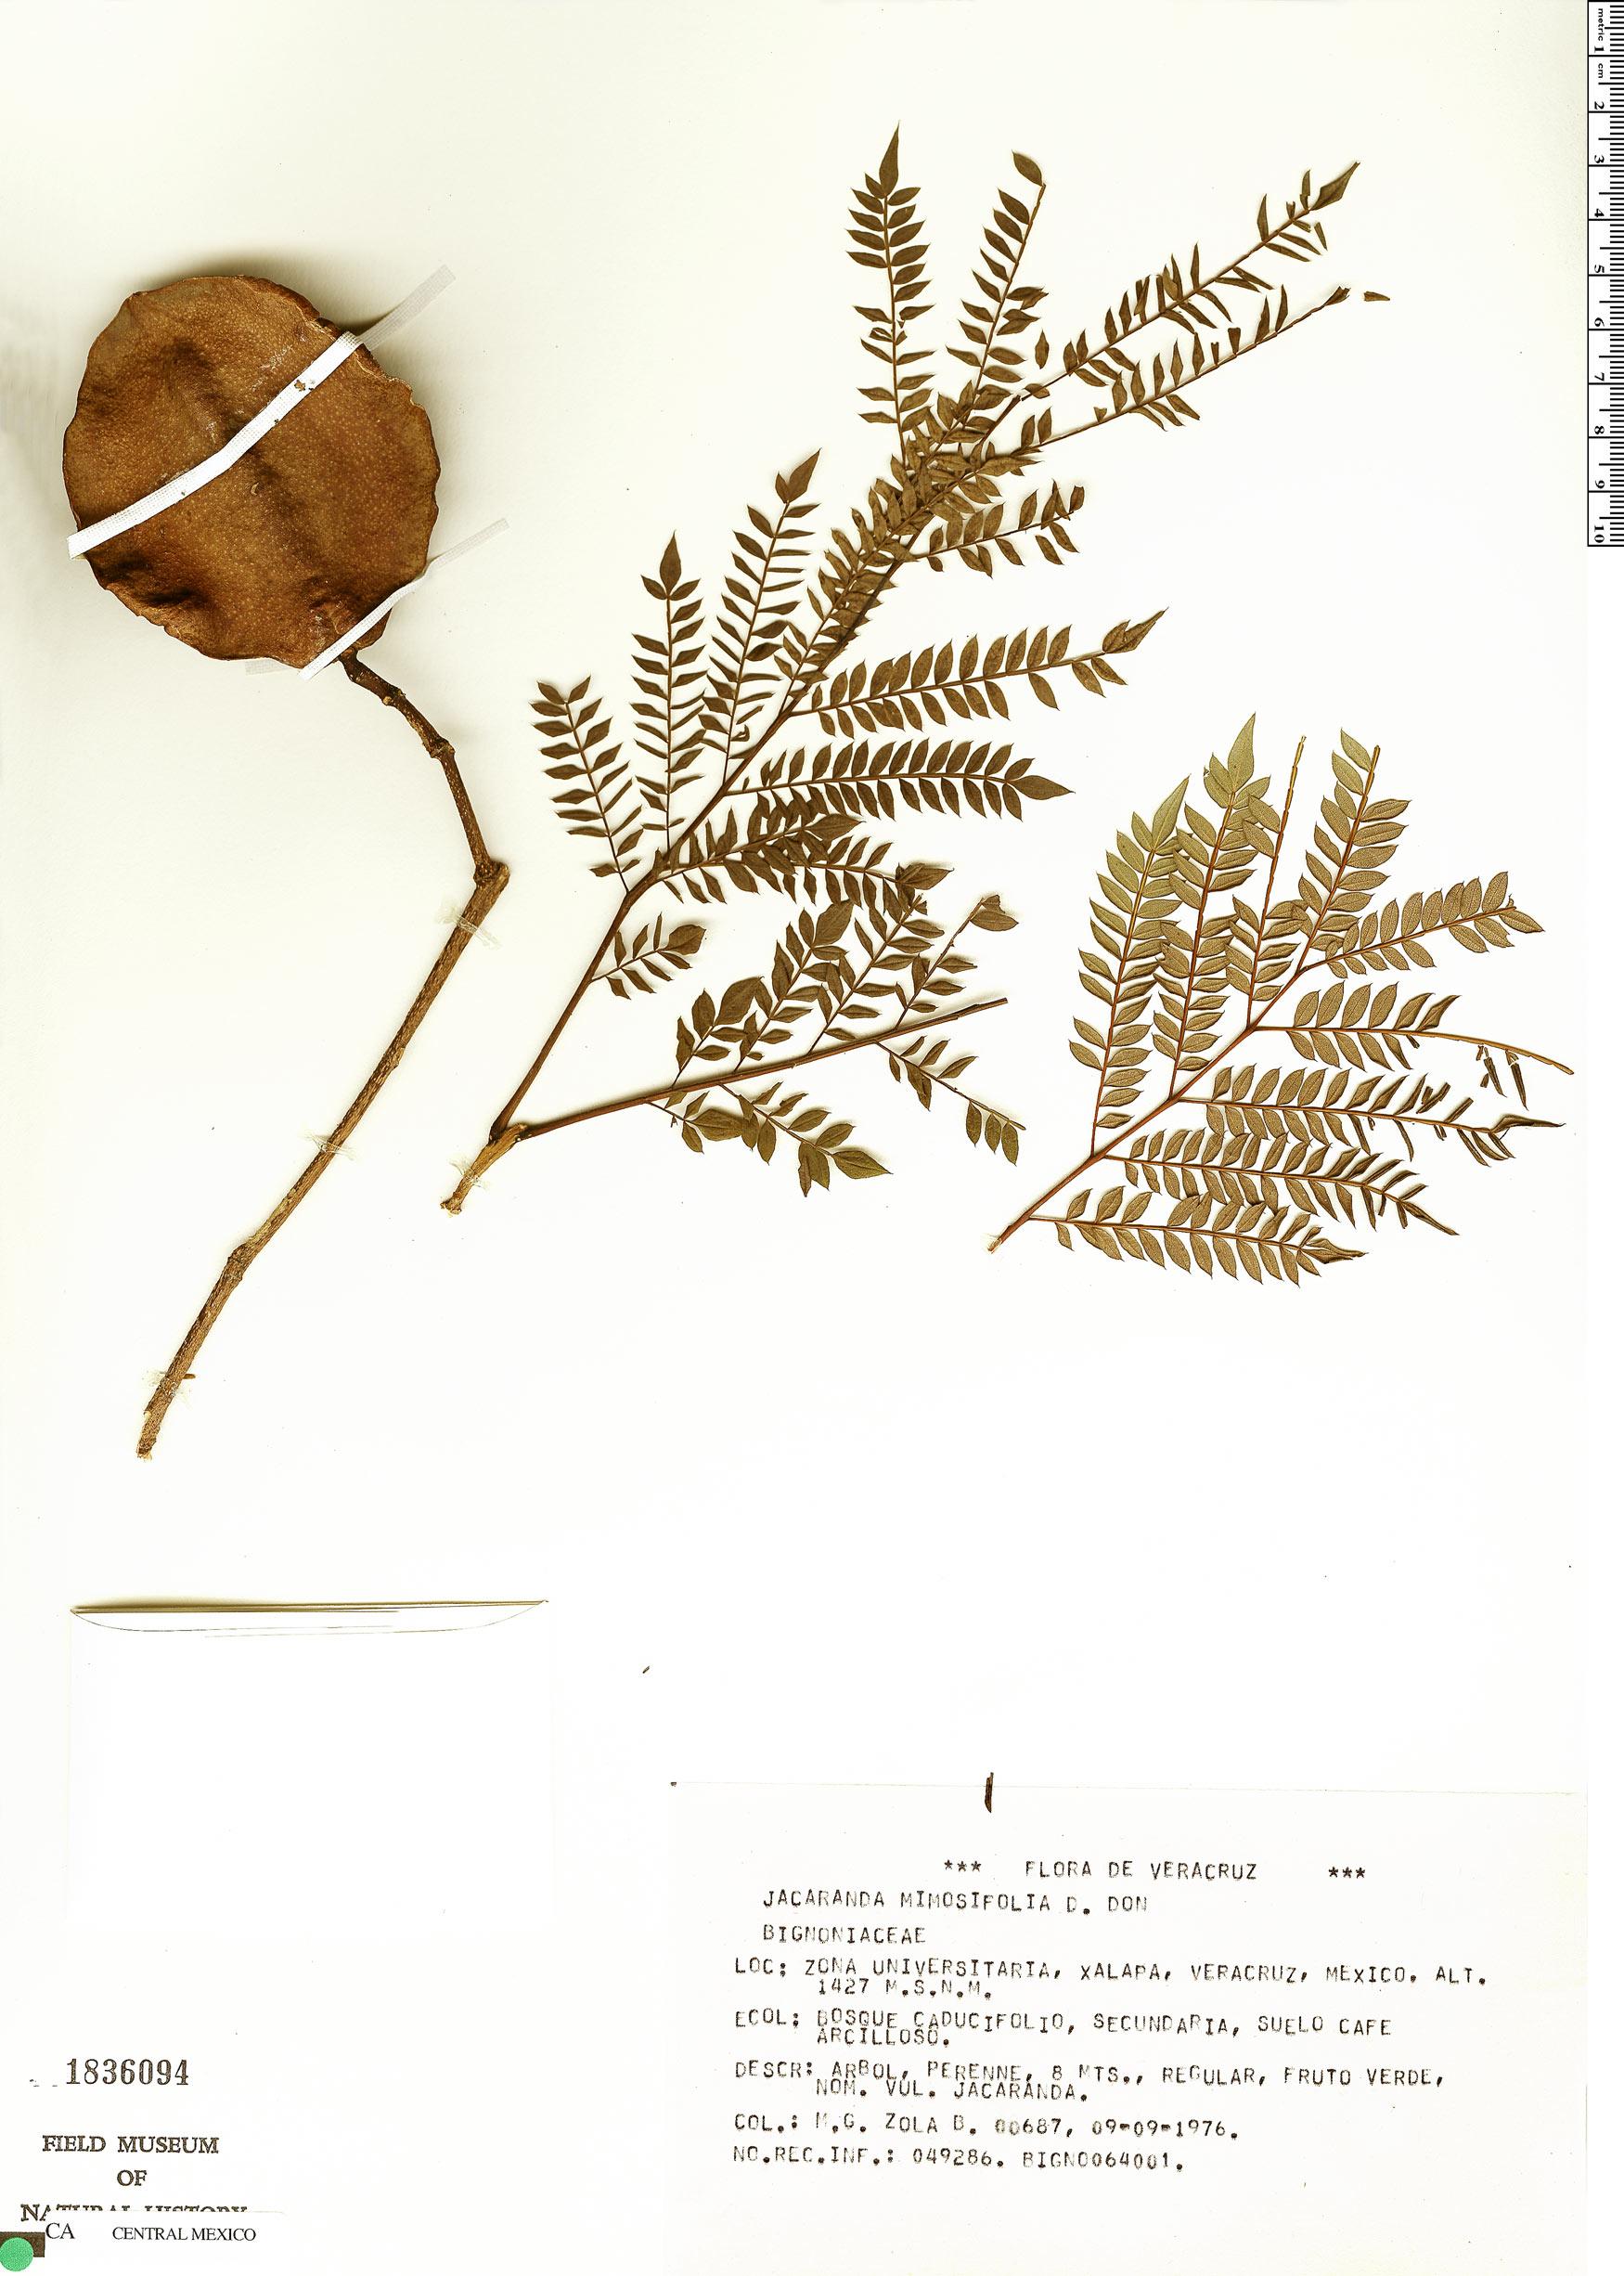 Espécimen: Jacaranda mimosifolia